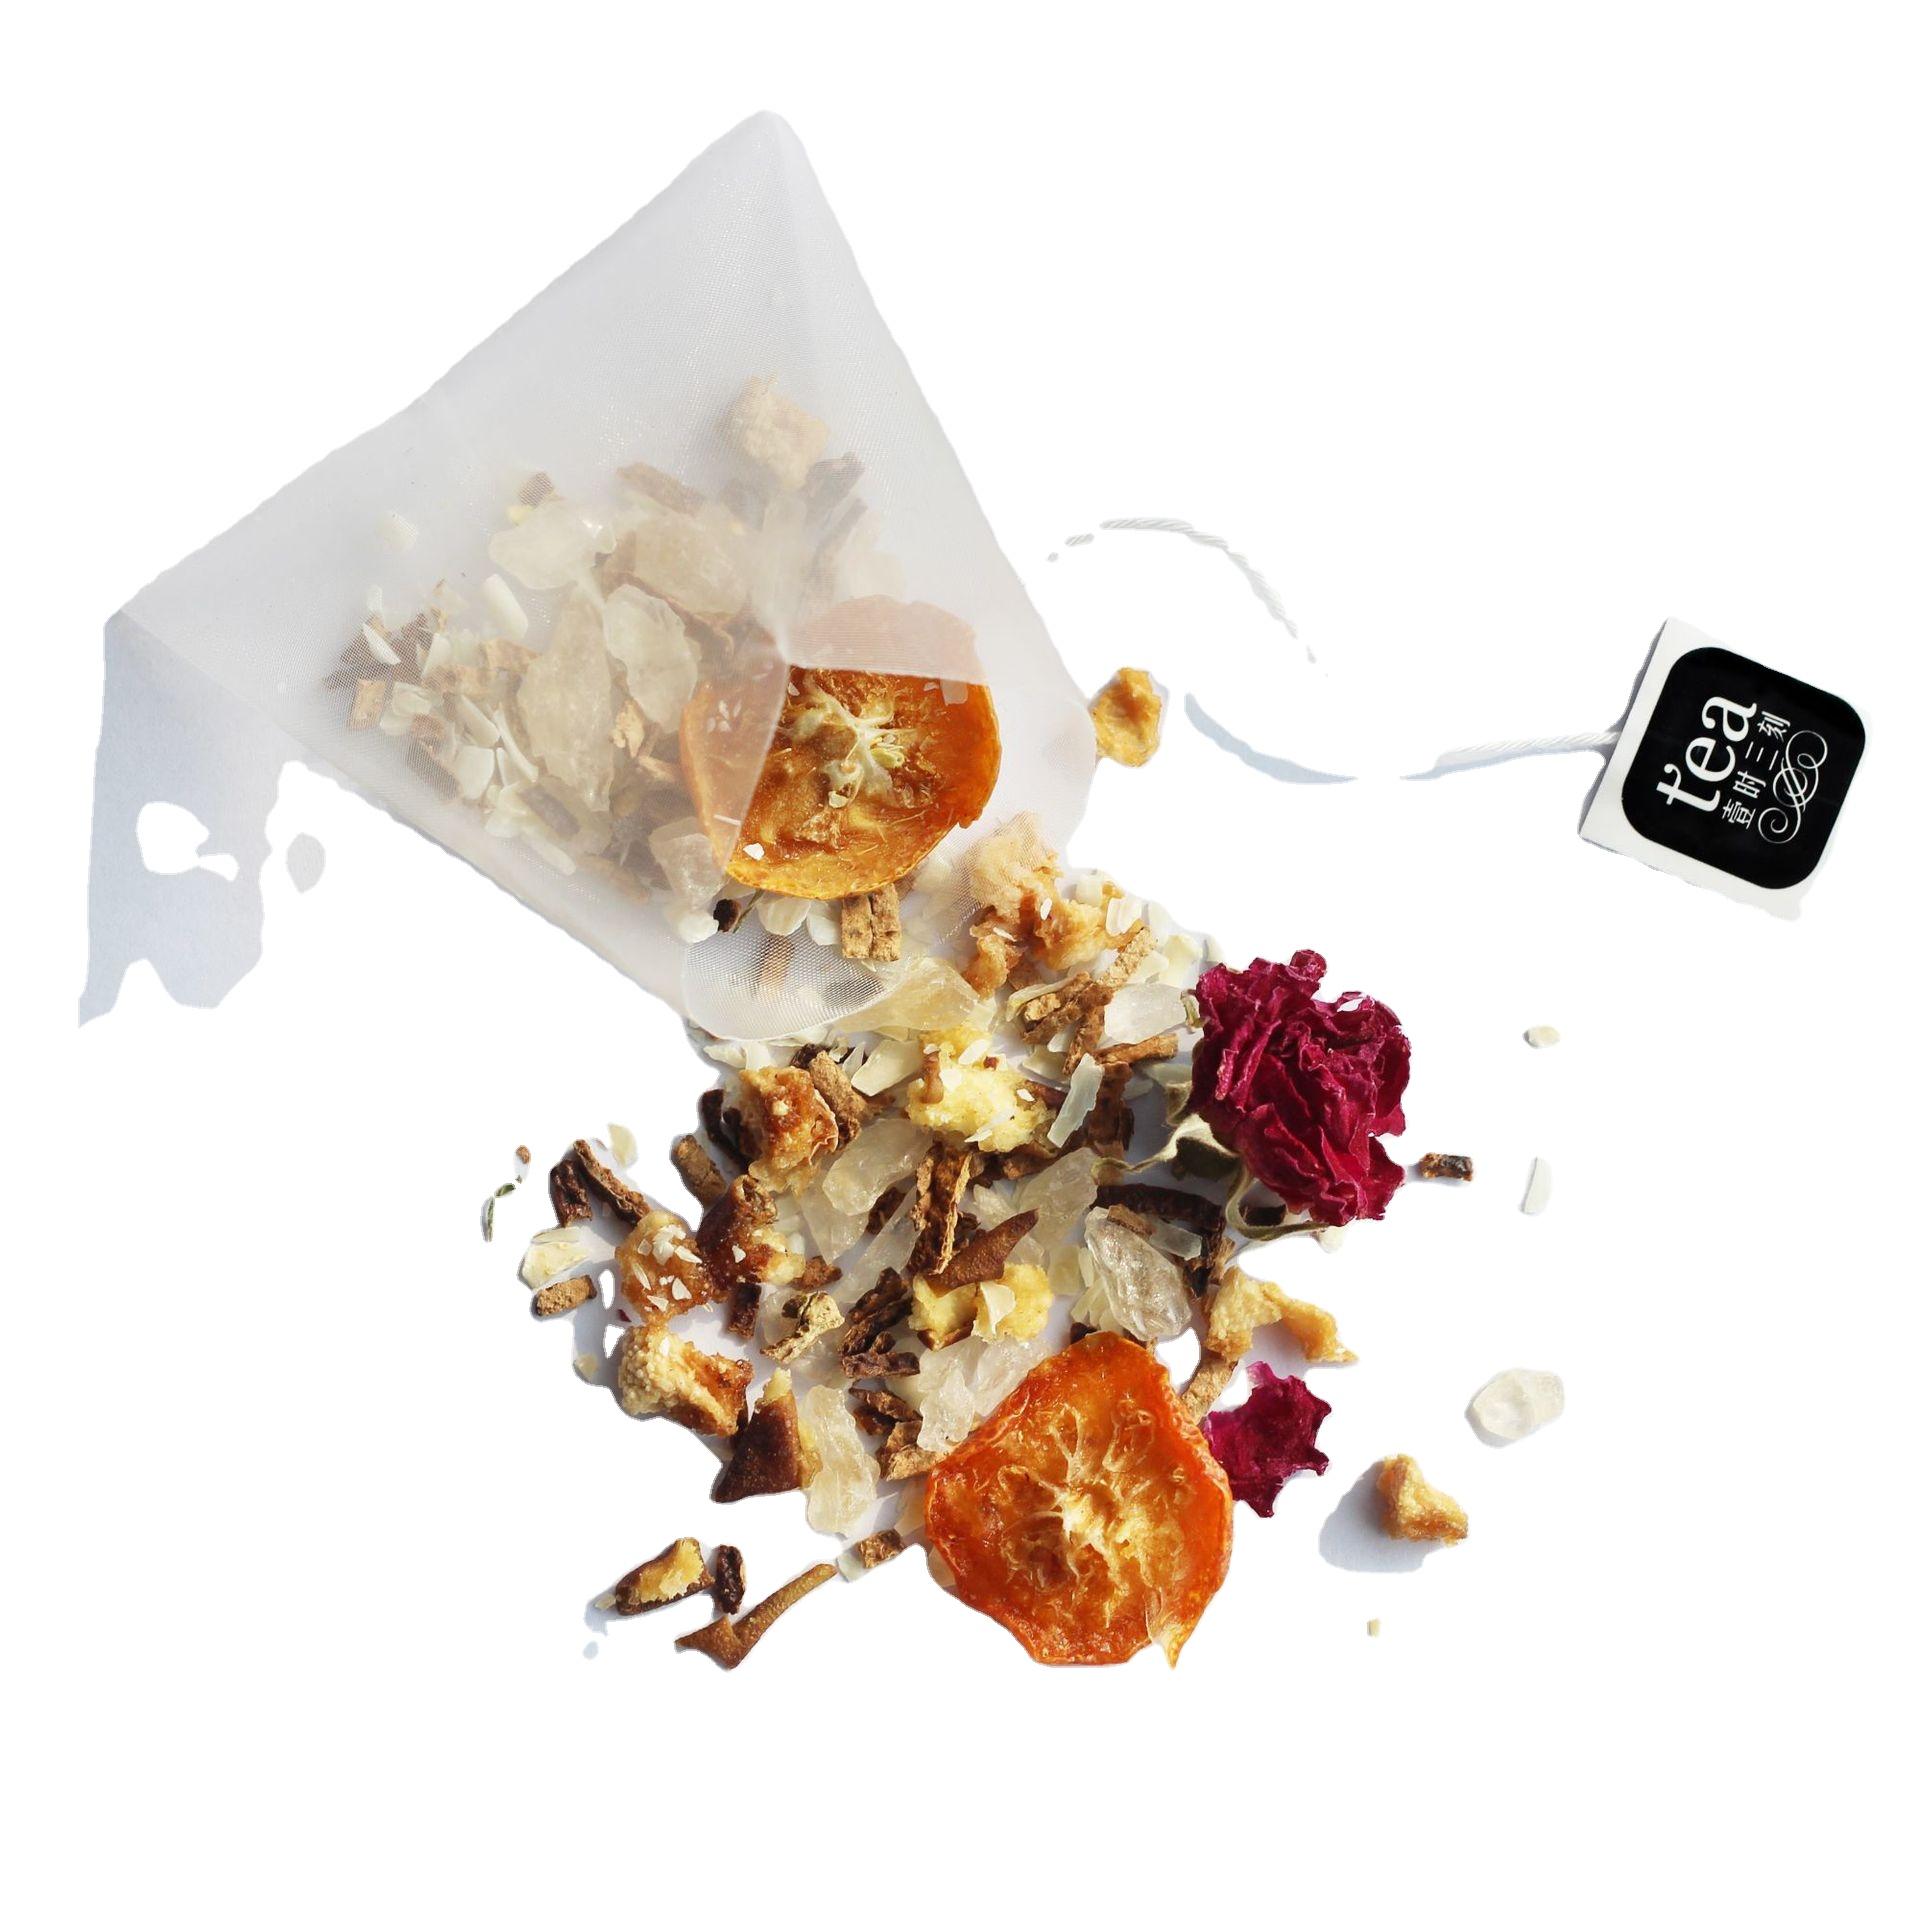 Dried Fruit Flower Herbal Detox Tea Health 100% in Individual Bags with Pyrus Nivalis Kumquat for Heat-clearing Women Flower Tea - 4uTea   4uTea.com